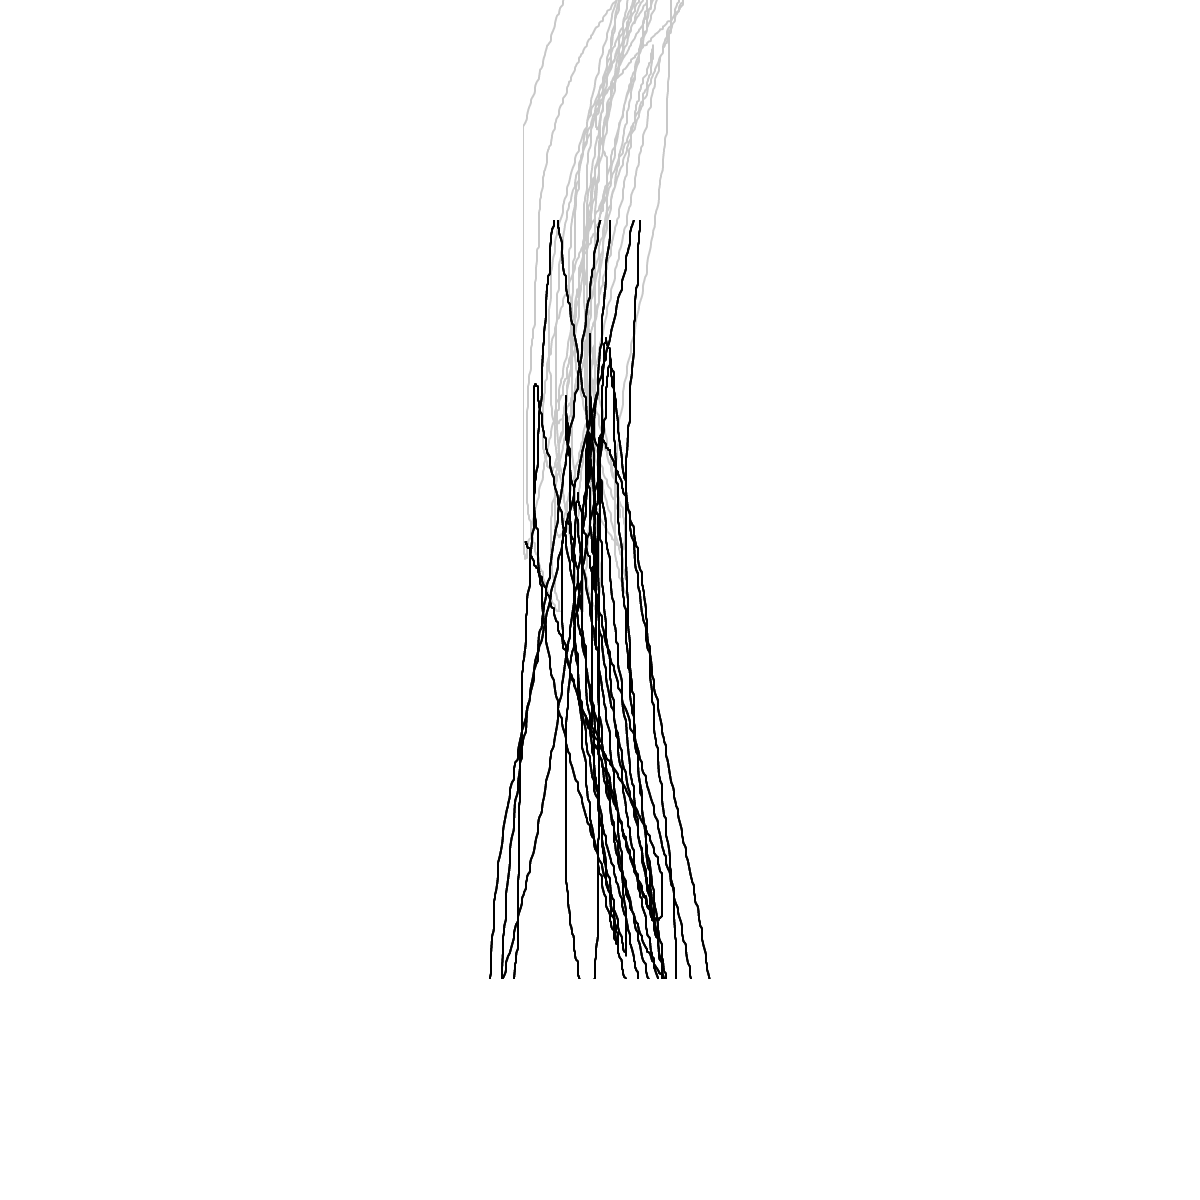 BAAAM drawing#23065 lat:52.4761466979980500lng: 13.4050283432006840